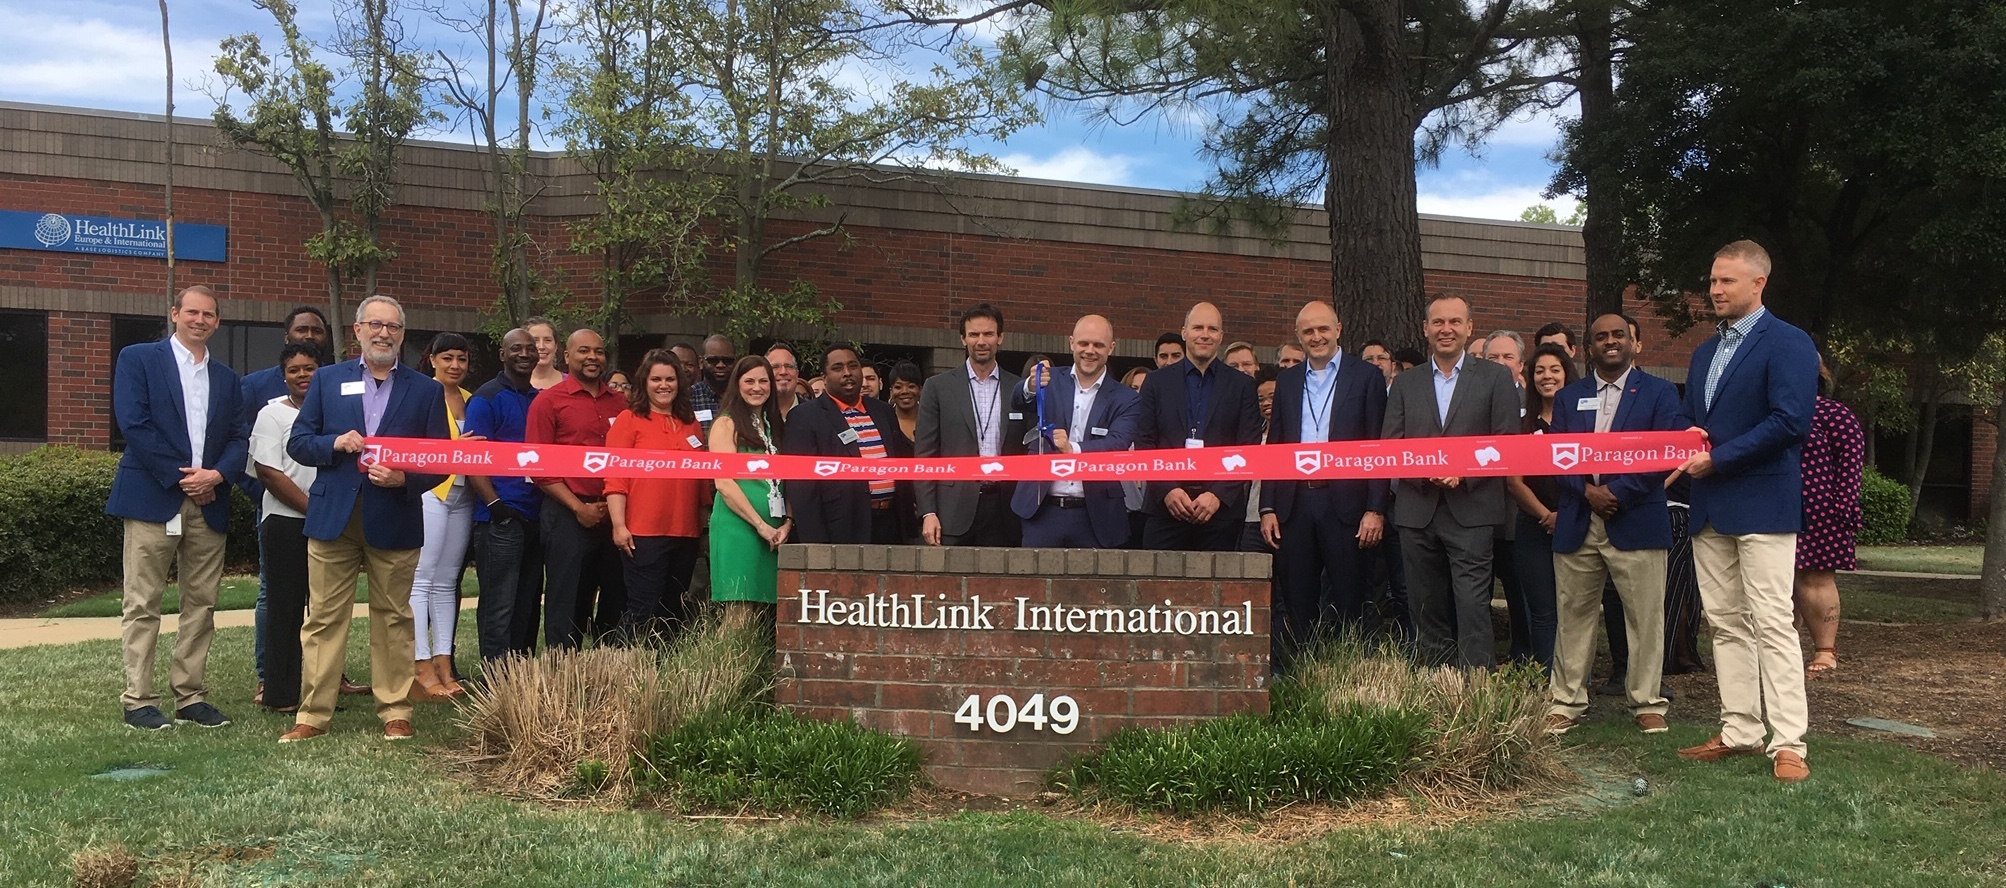 HealthLink International Opens State-of-the-Art Medical ...